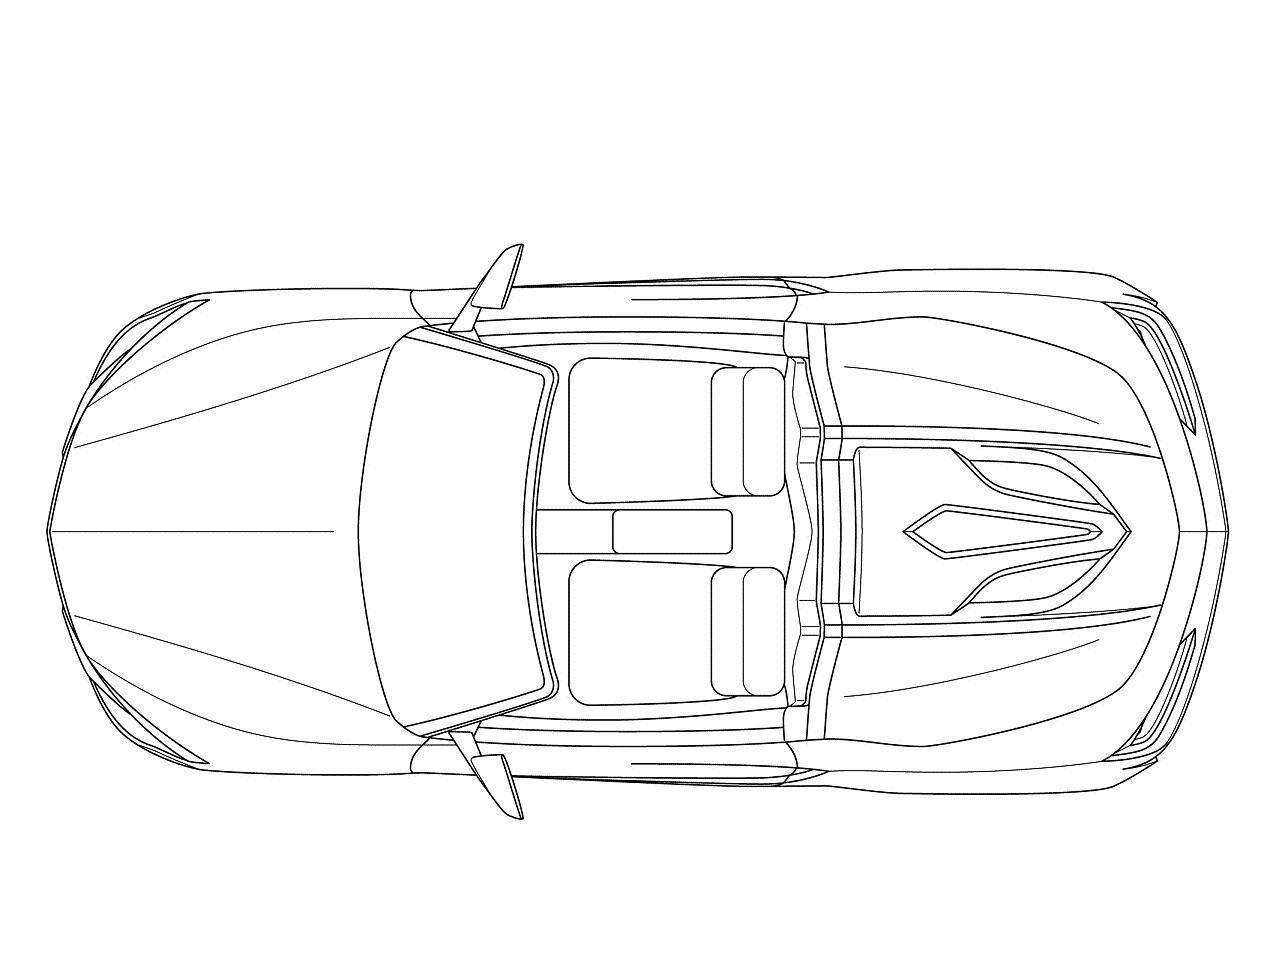 Car Top View Drawing At Getdrawings